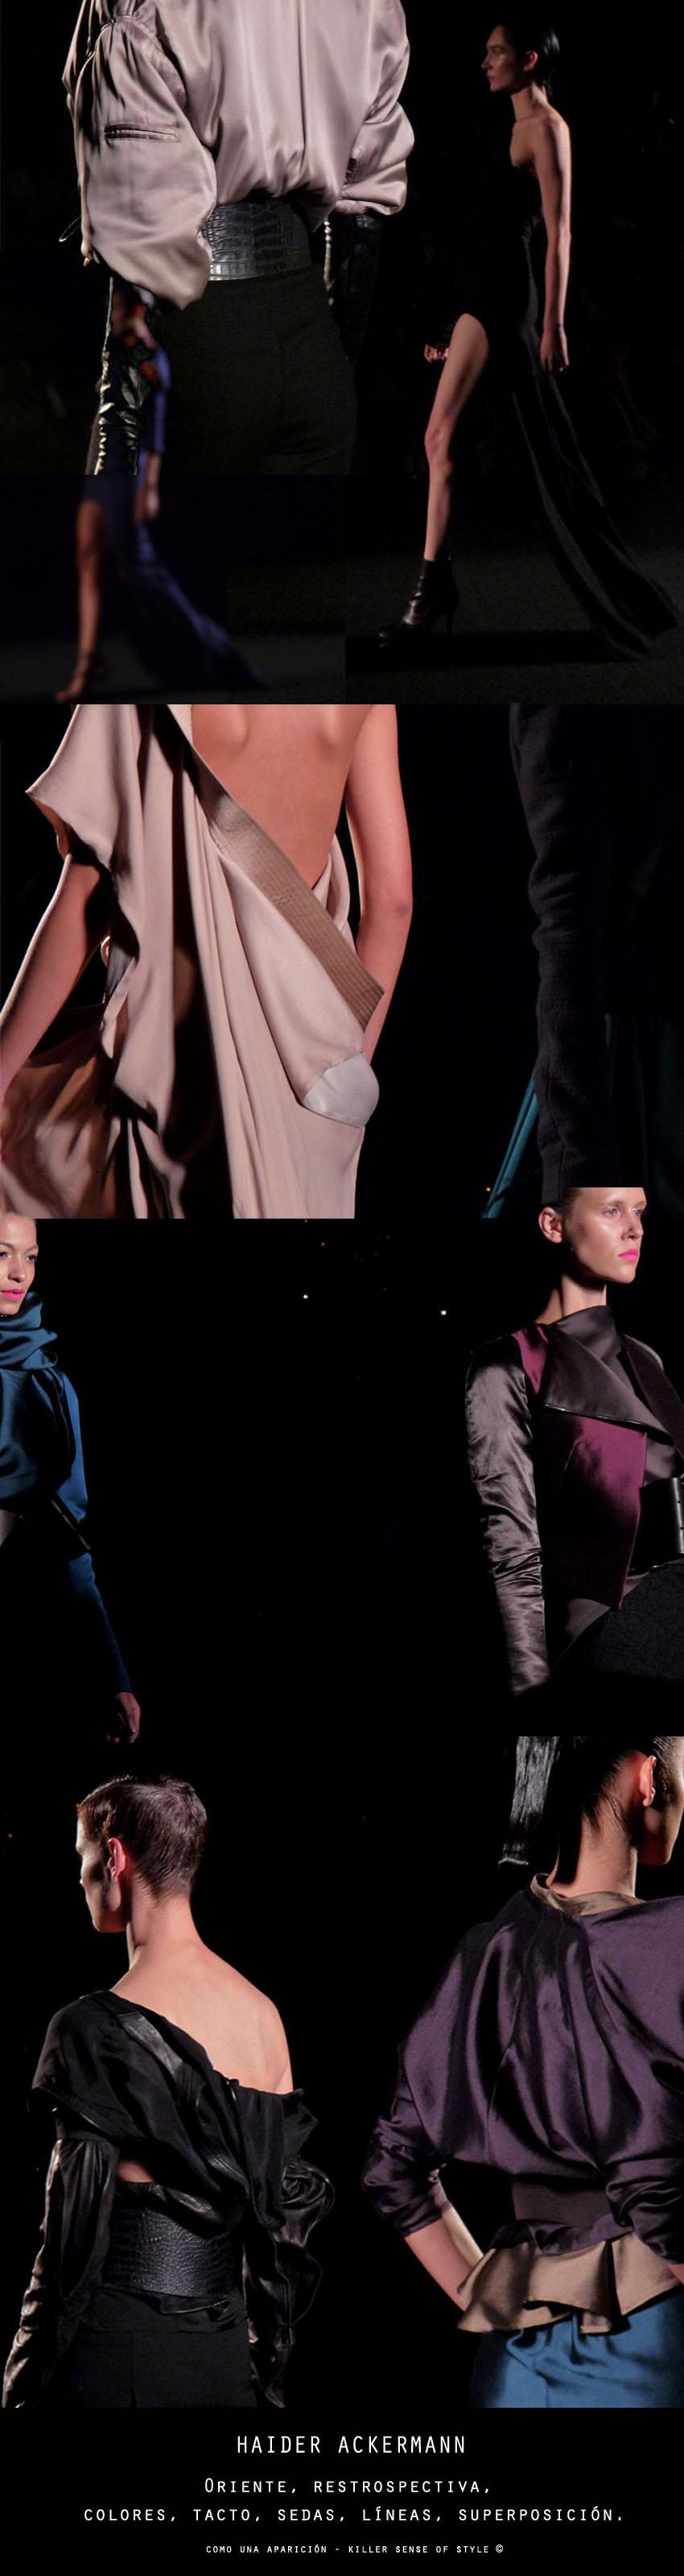 haider-ackermann-colombiamoda-colombia-fashion-designer-como-una-aparición-killer-sense-of-style